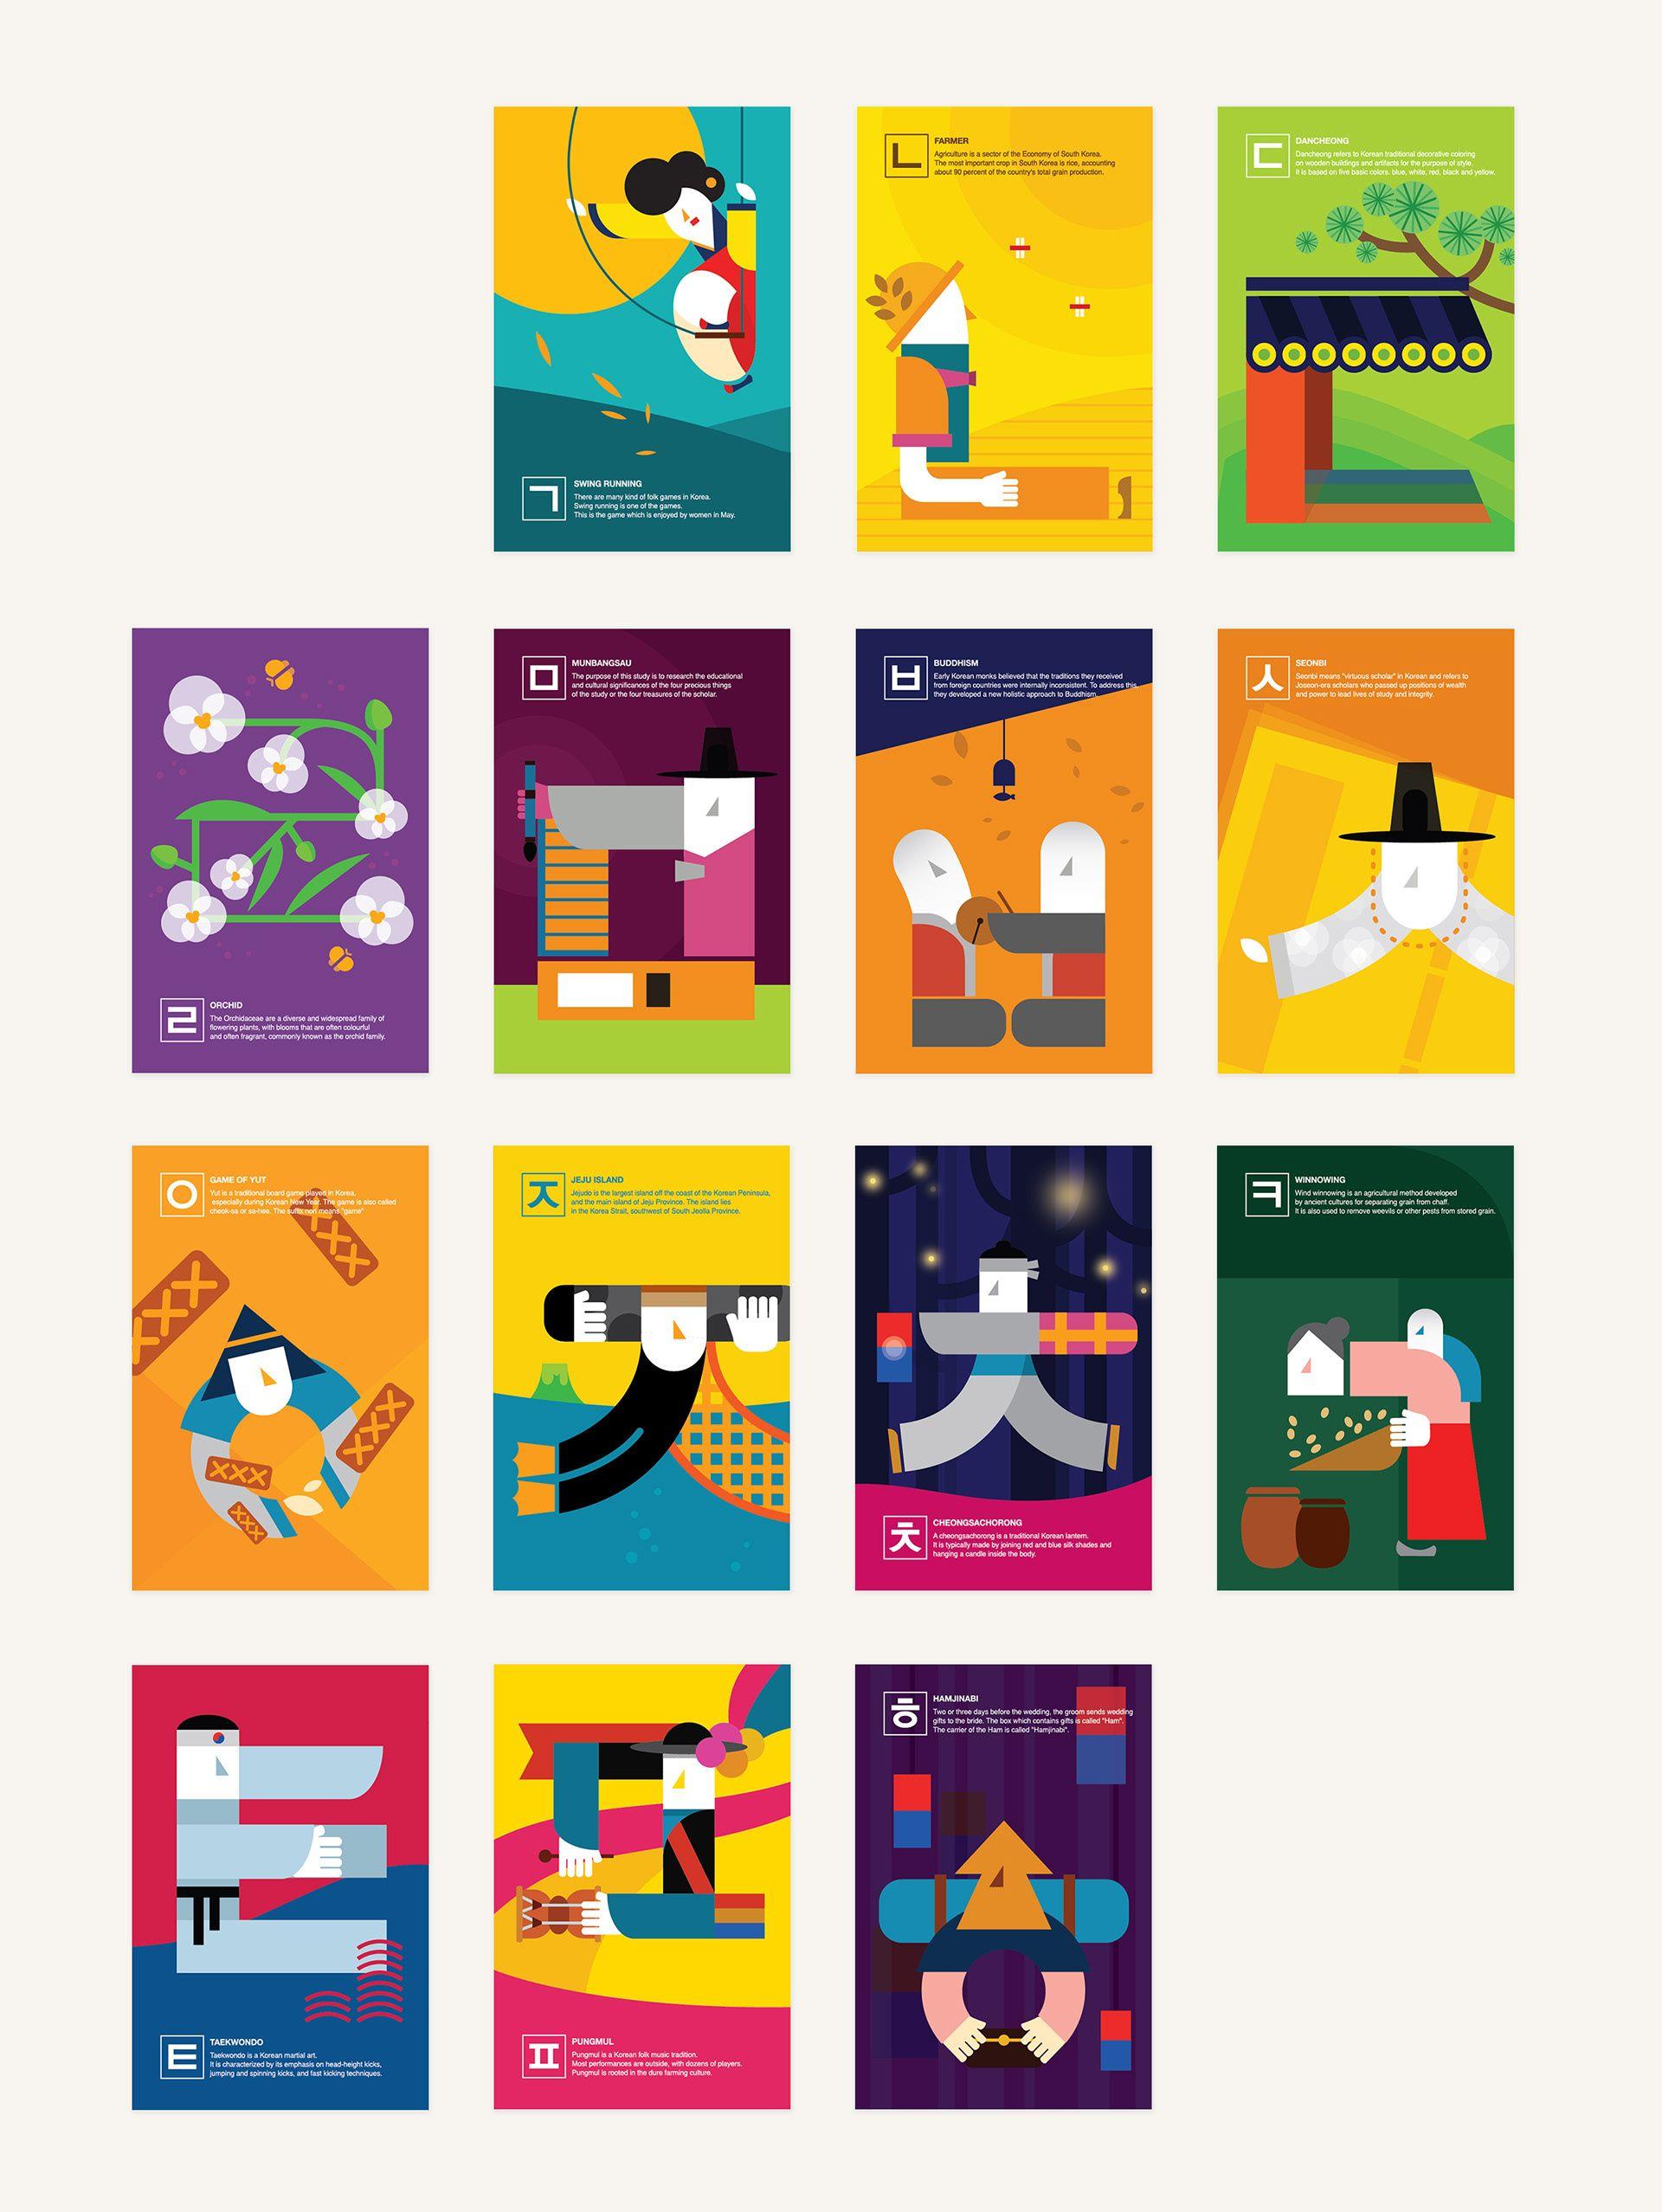 Hangul clipart clipart library download Jinaon - Hangul Illustration | 装帧书籍 in 2019 | Illustration ... clipart library download